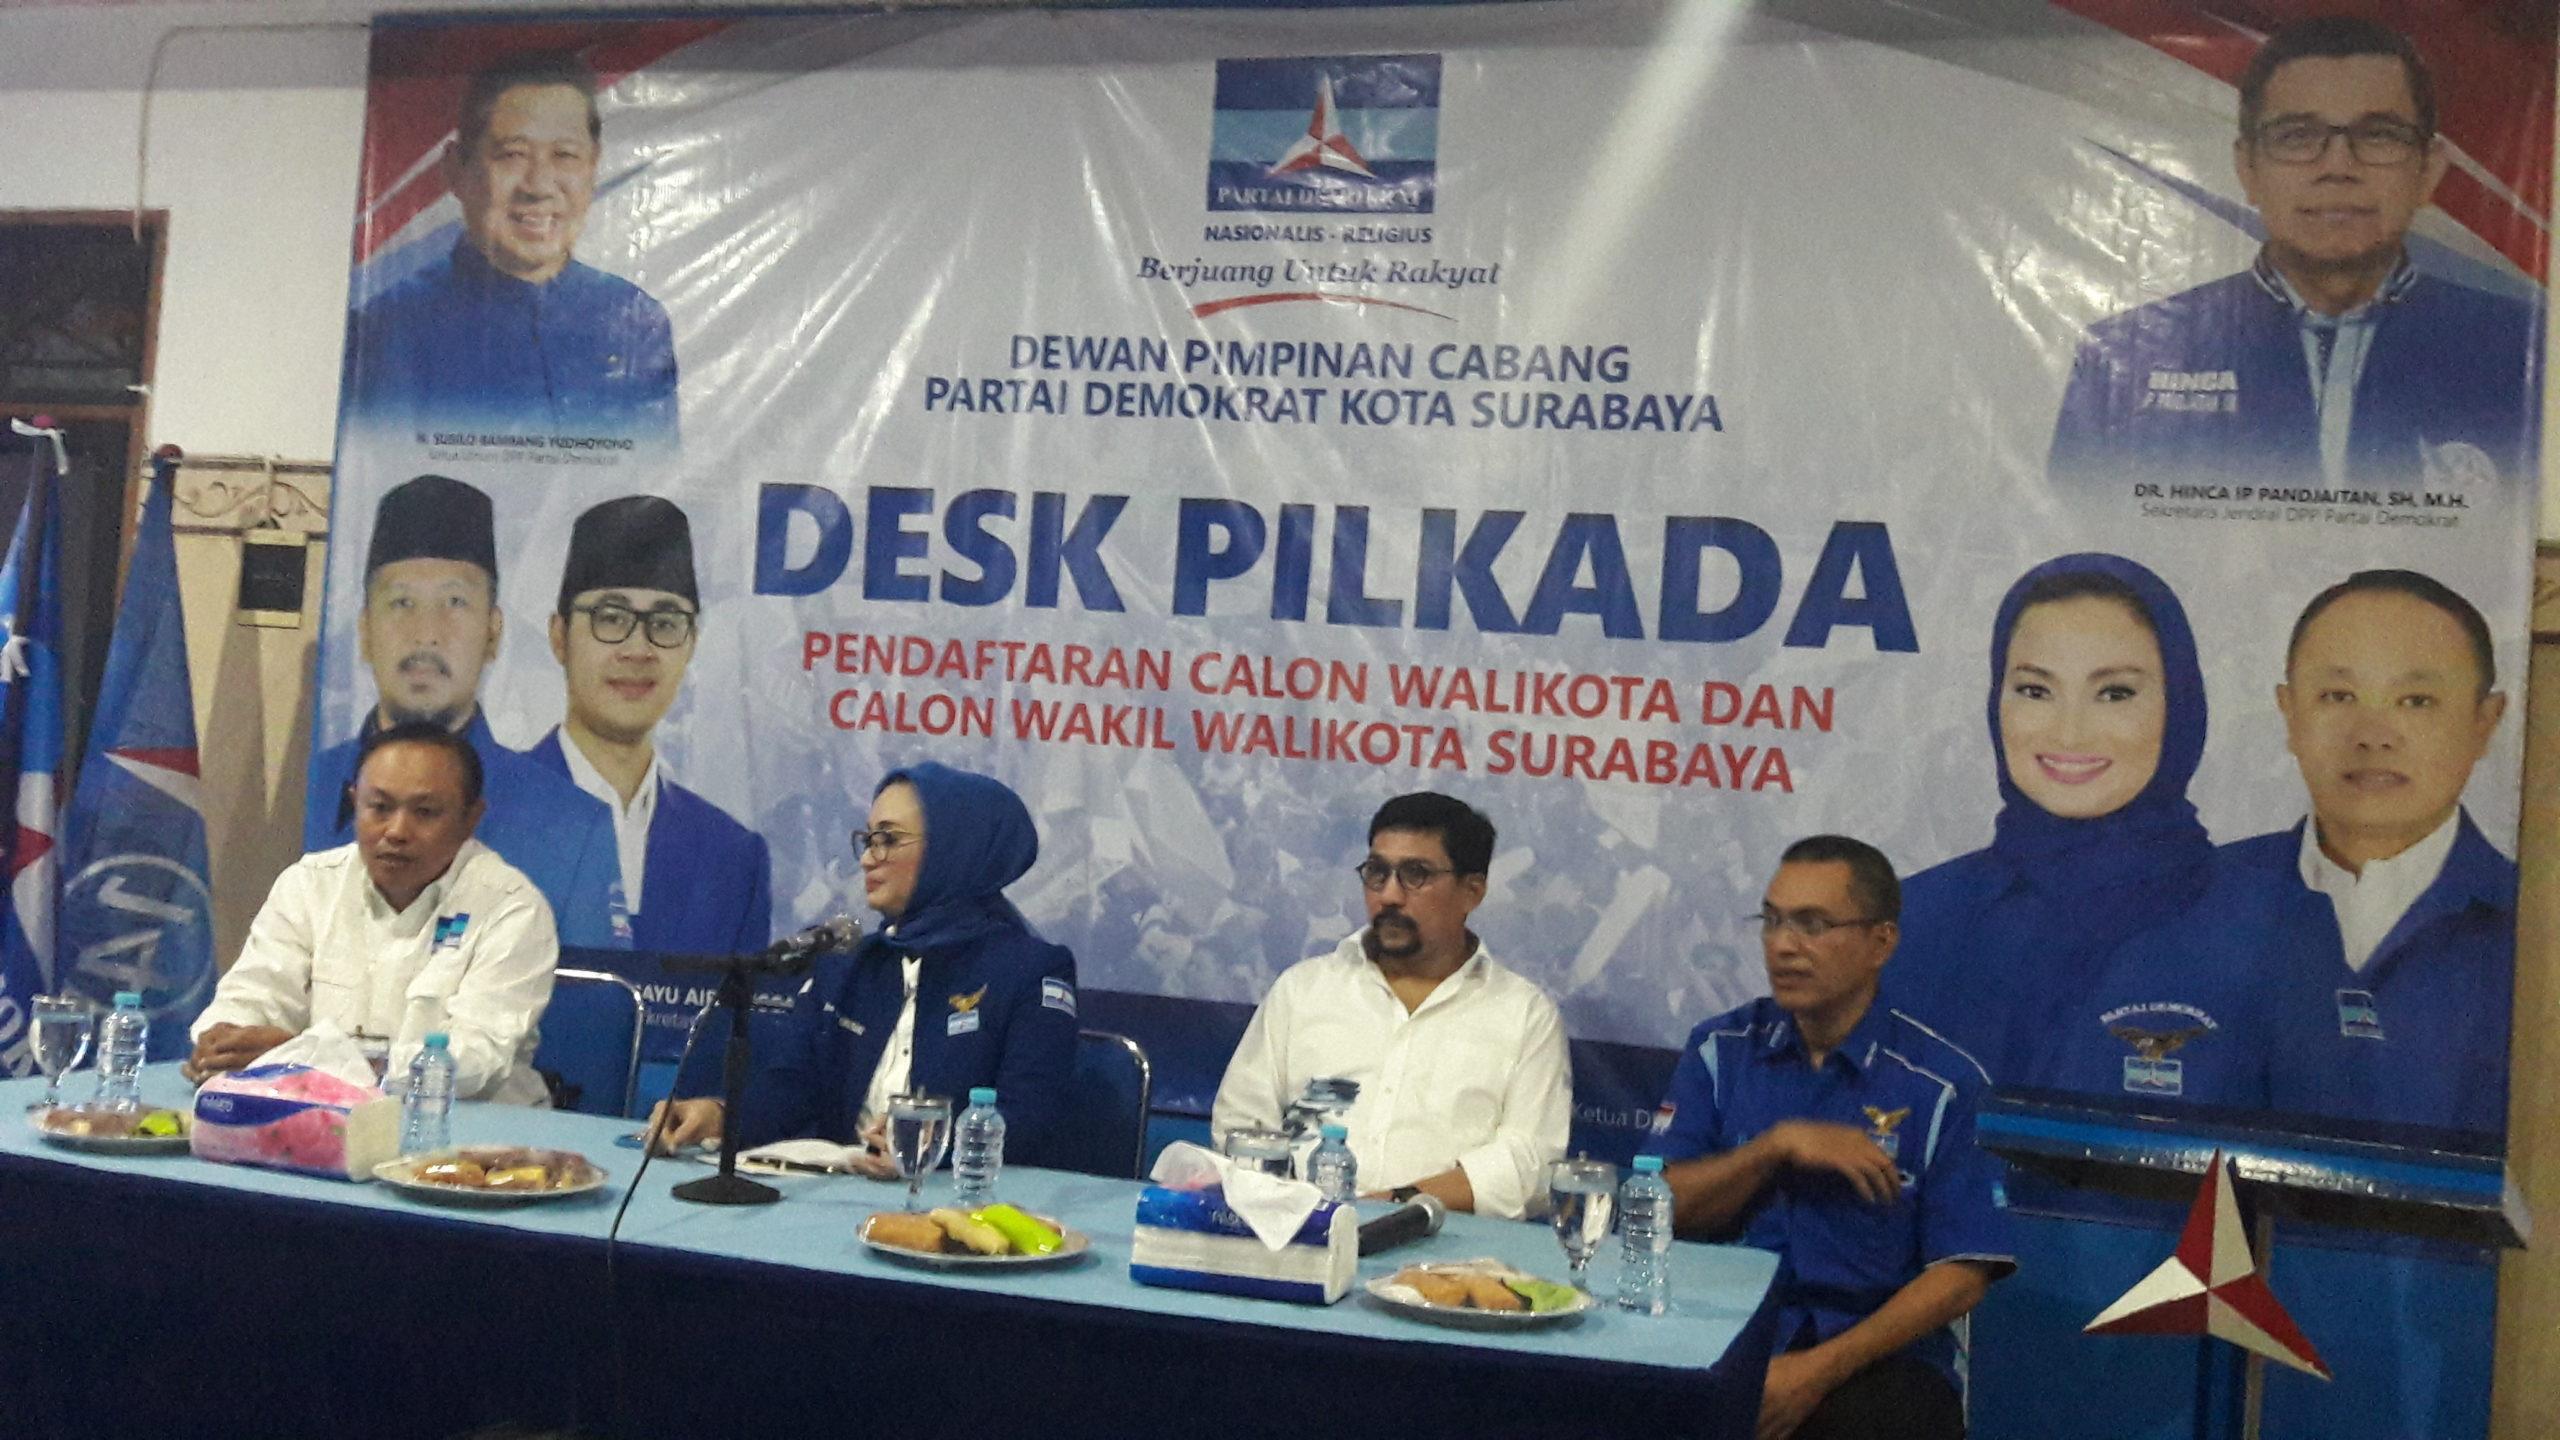 bacawali Surabaya Irjen Pol (Purn) Machfud Arifin giliran melamar ke Partai Demokrat untuk diajak membangun koalisi di Pilwali Surabaya